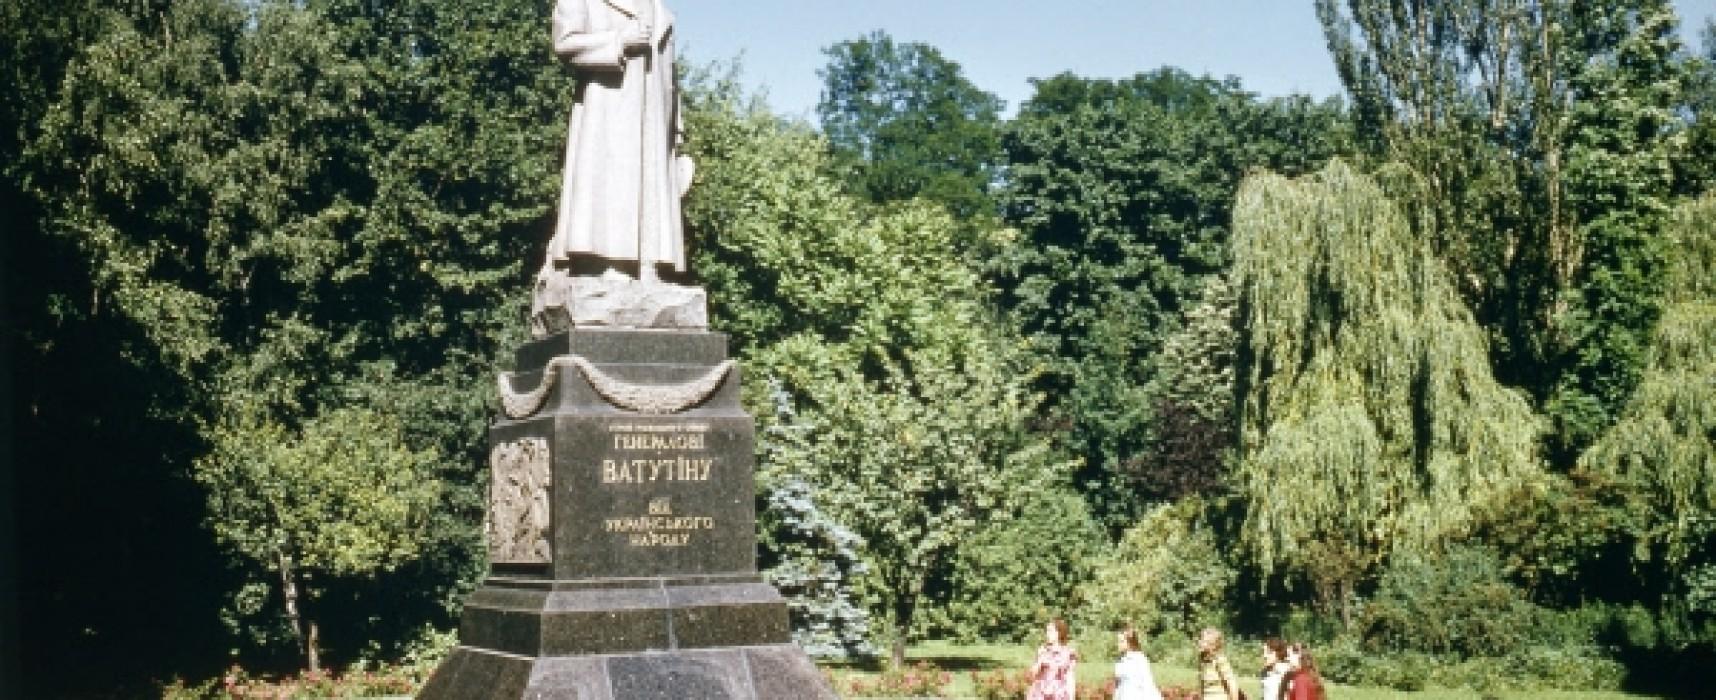 Фейк: Власти Киева хотят снести памятник генералу Ватутину